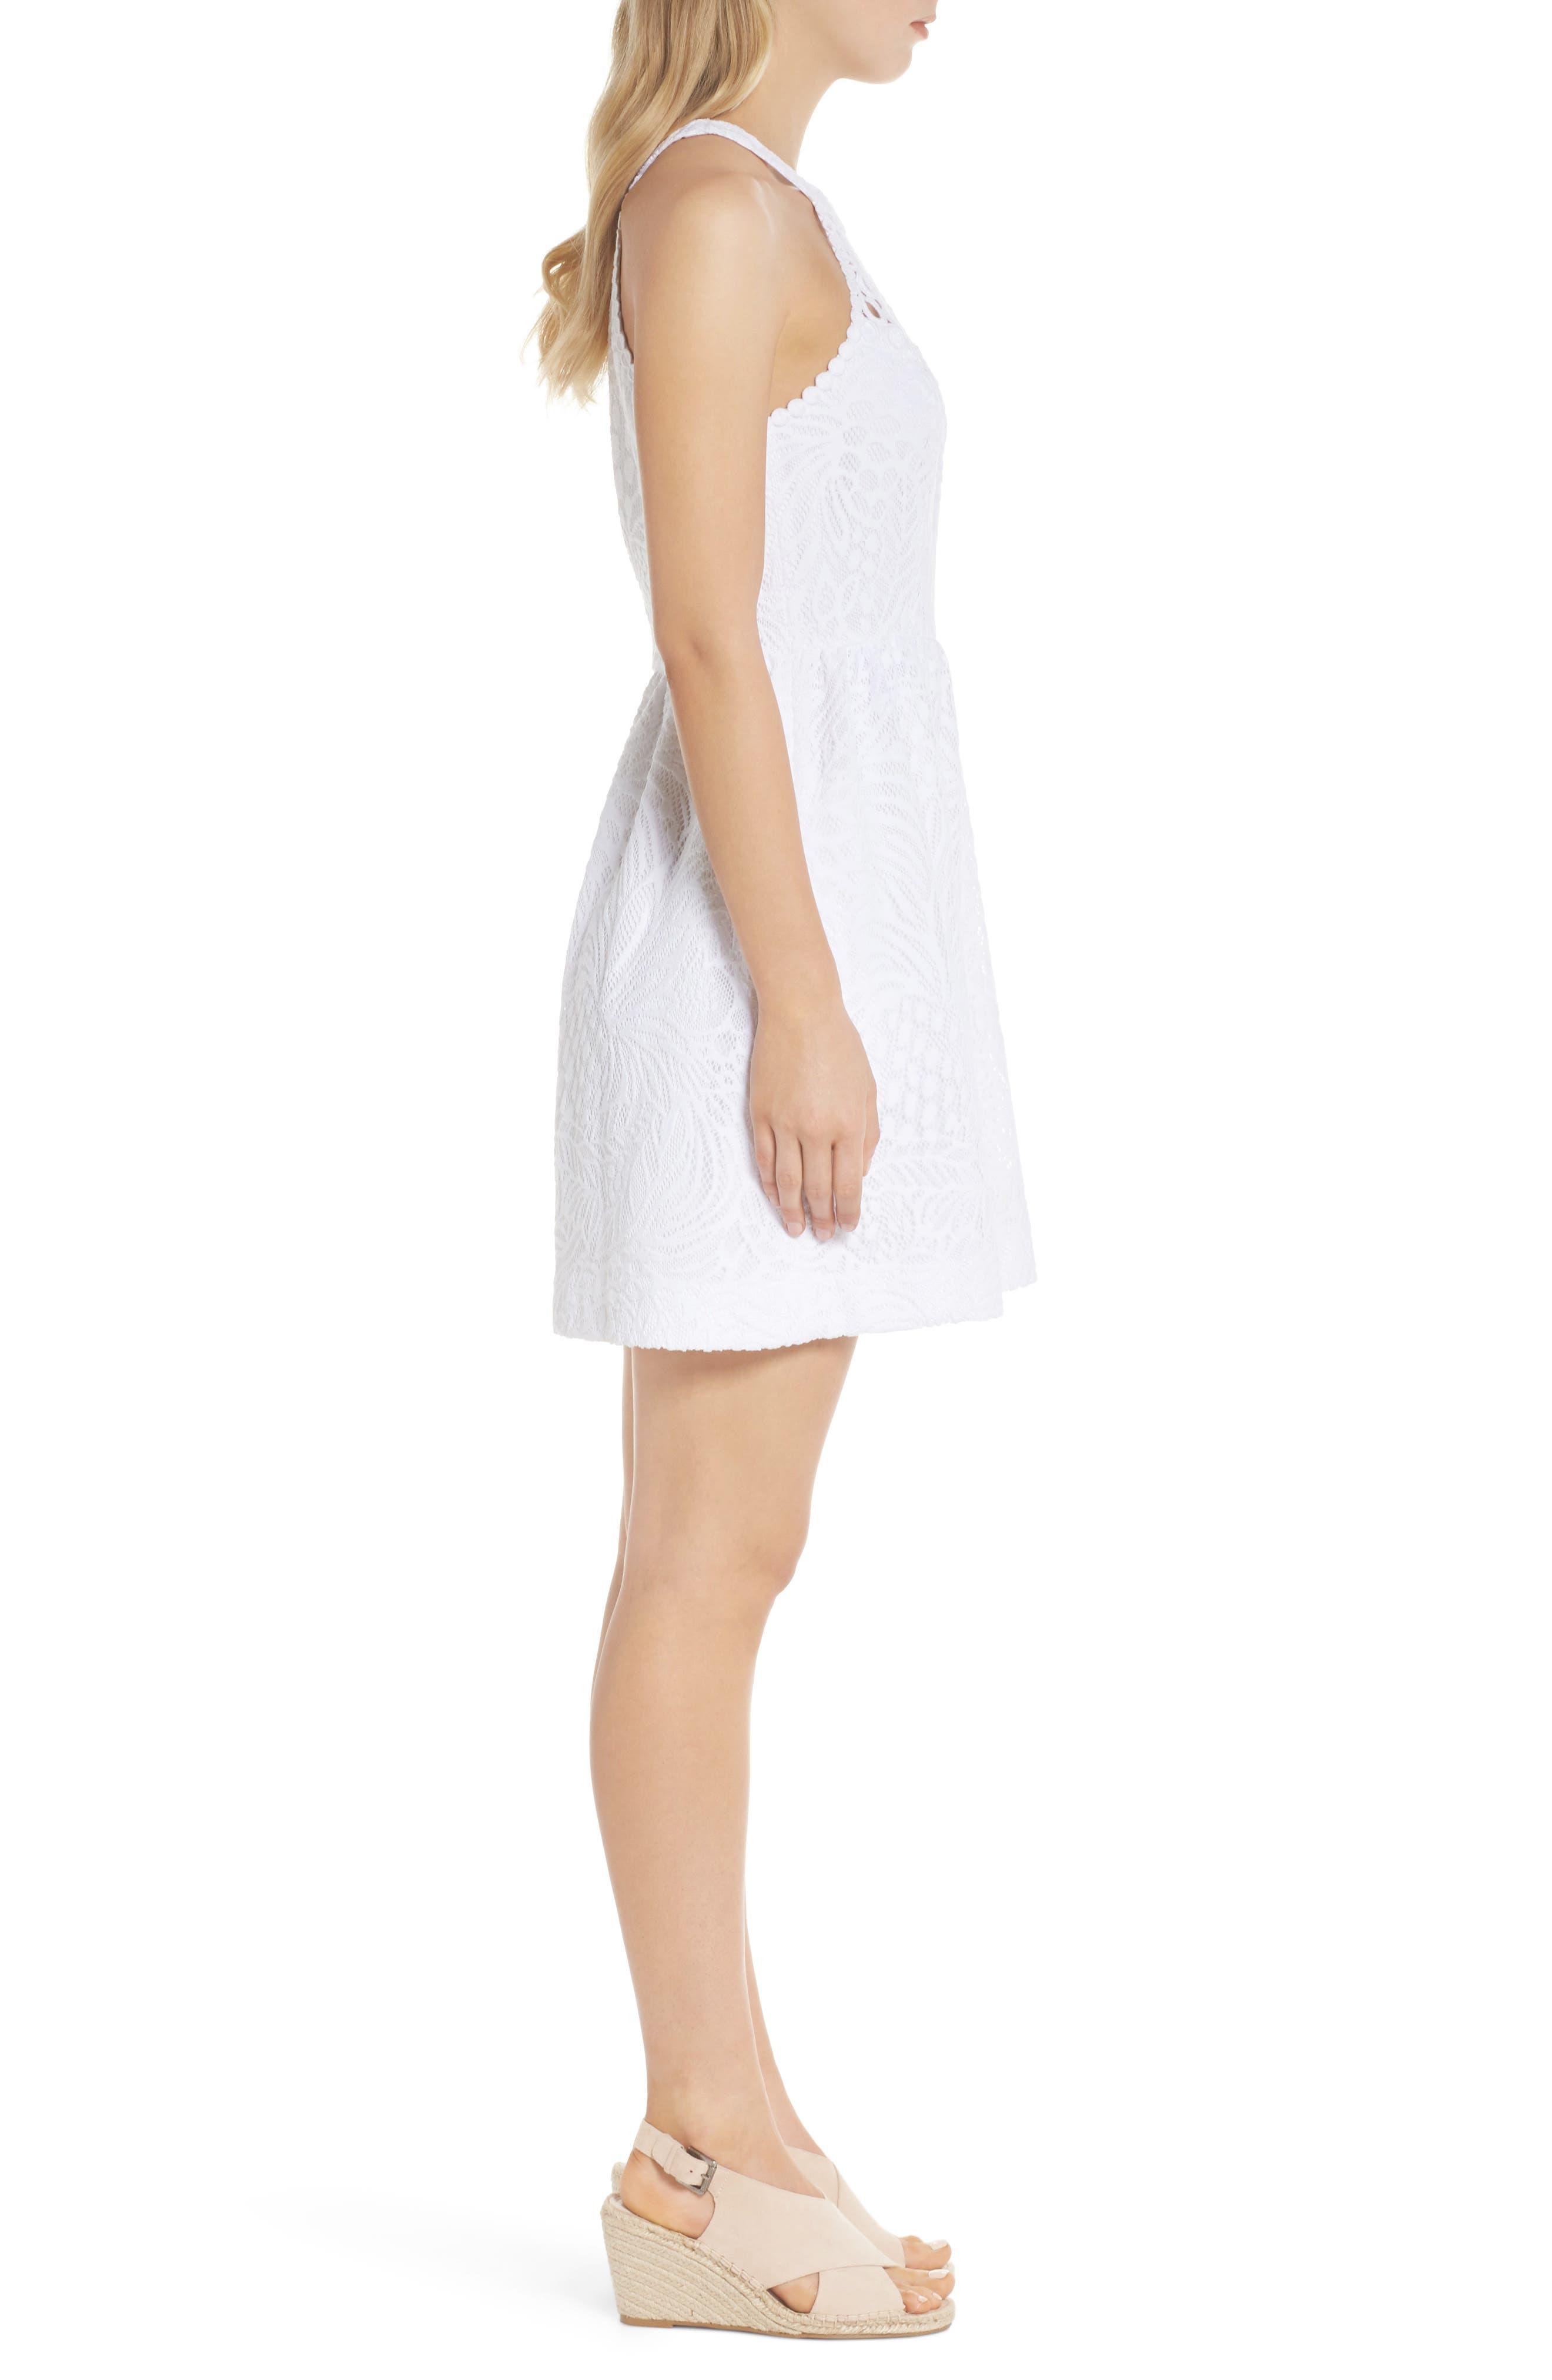 Kinley Halter Dress,                             Alternate thumbnail 3, color,                             RESORT WHITE TROPICAL LACE